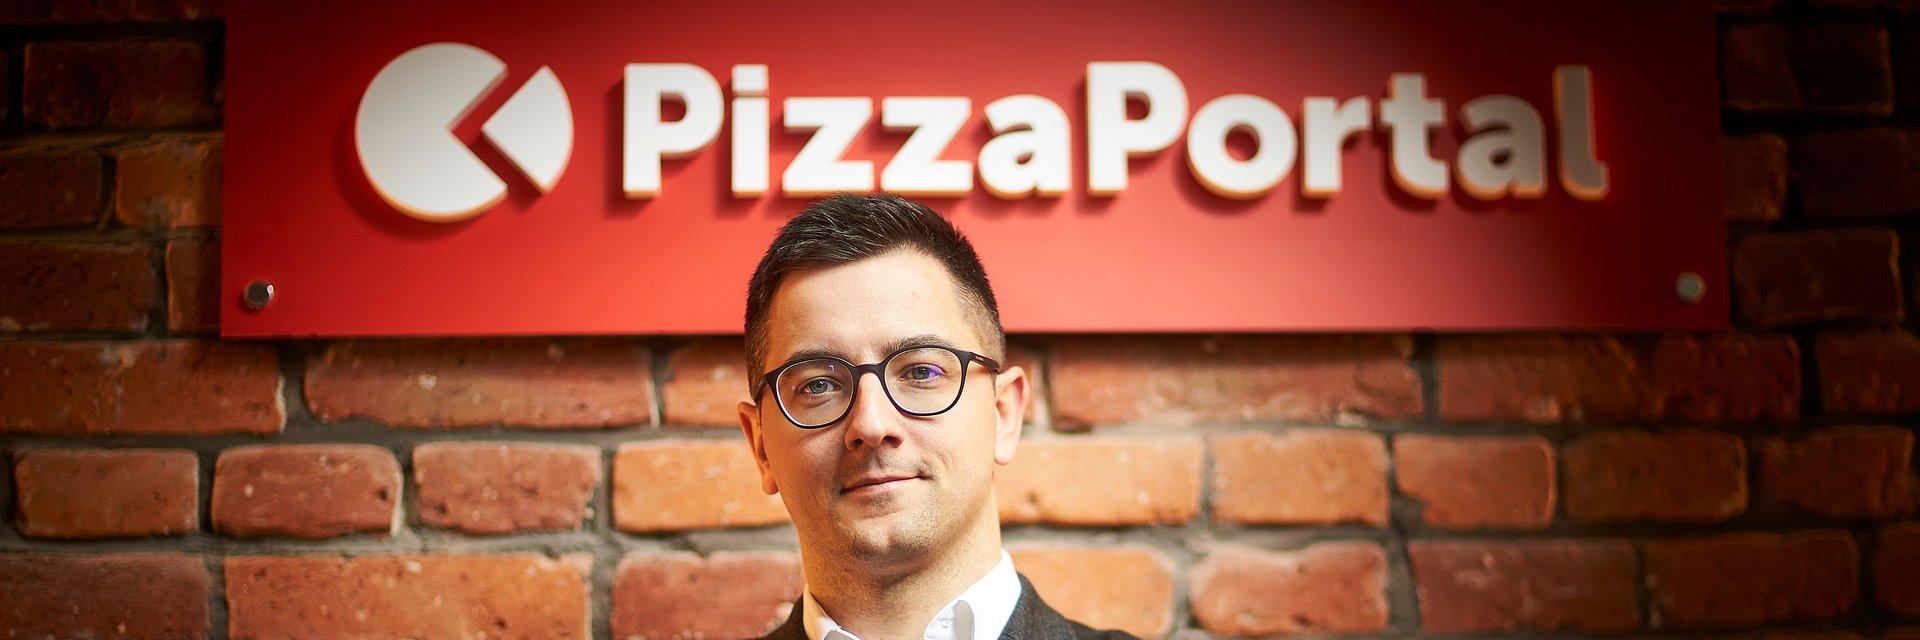 PizzaPortal.pl podsumowuje rok 2019